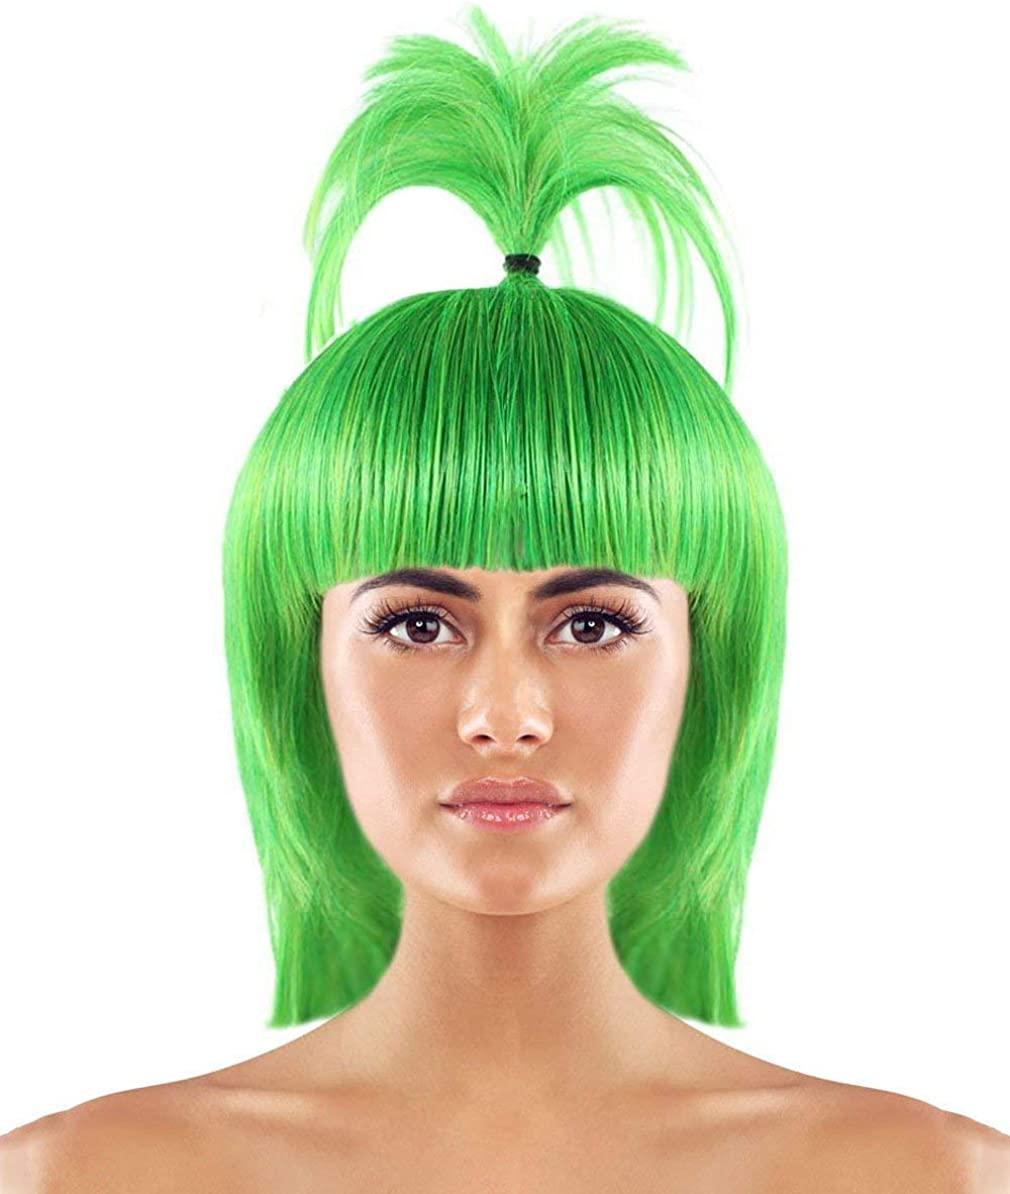 Wig for Cosplay Pokemon Oddish HW-2353